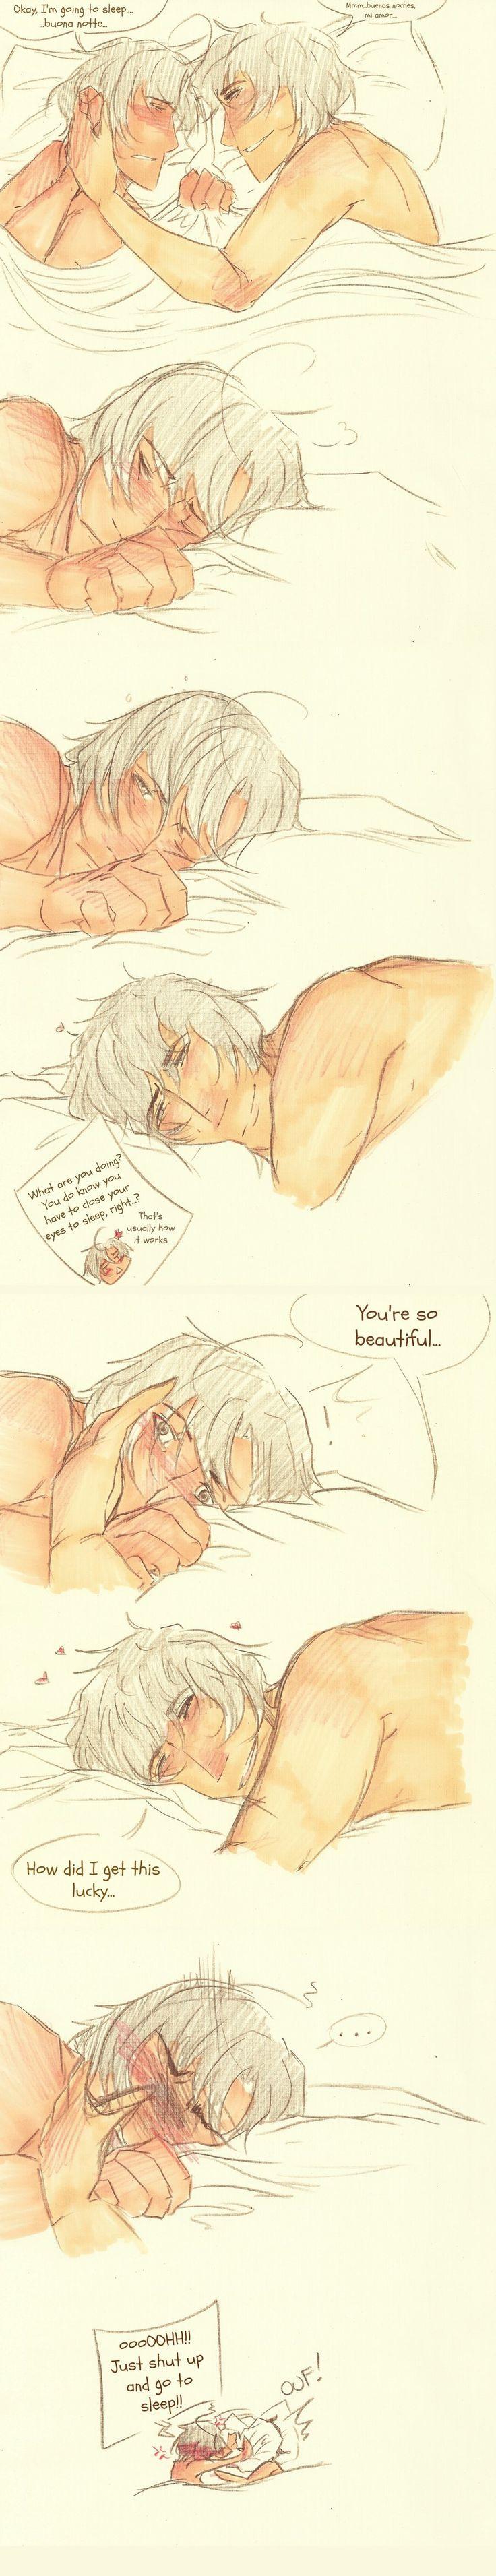 You're So Beautiful... by edwardsuoh13.deviantart.com on @DeviantArt<----Si Romano es muy hermoso. .siempre< cuuutttee.